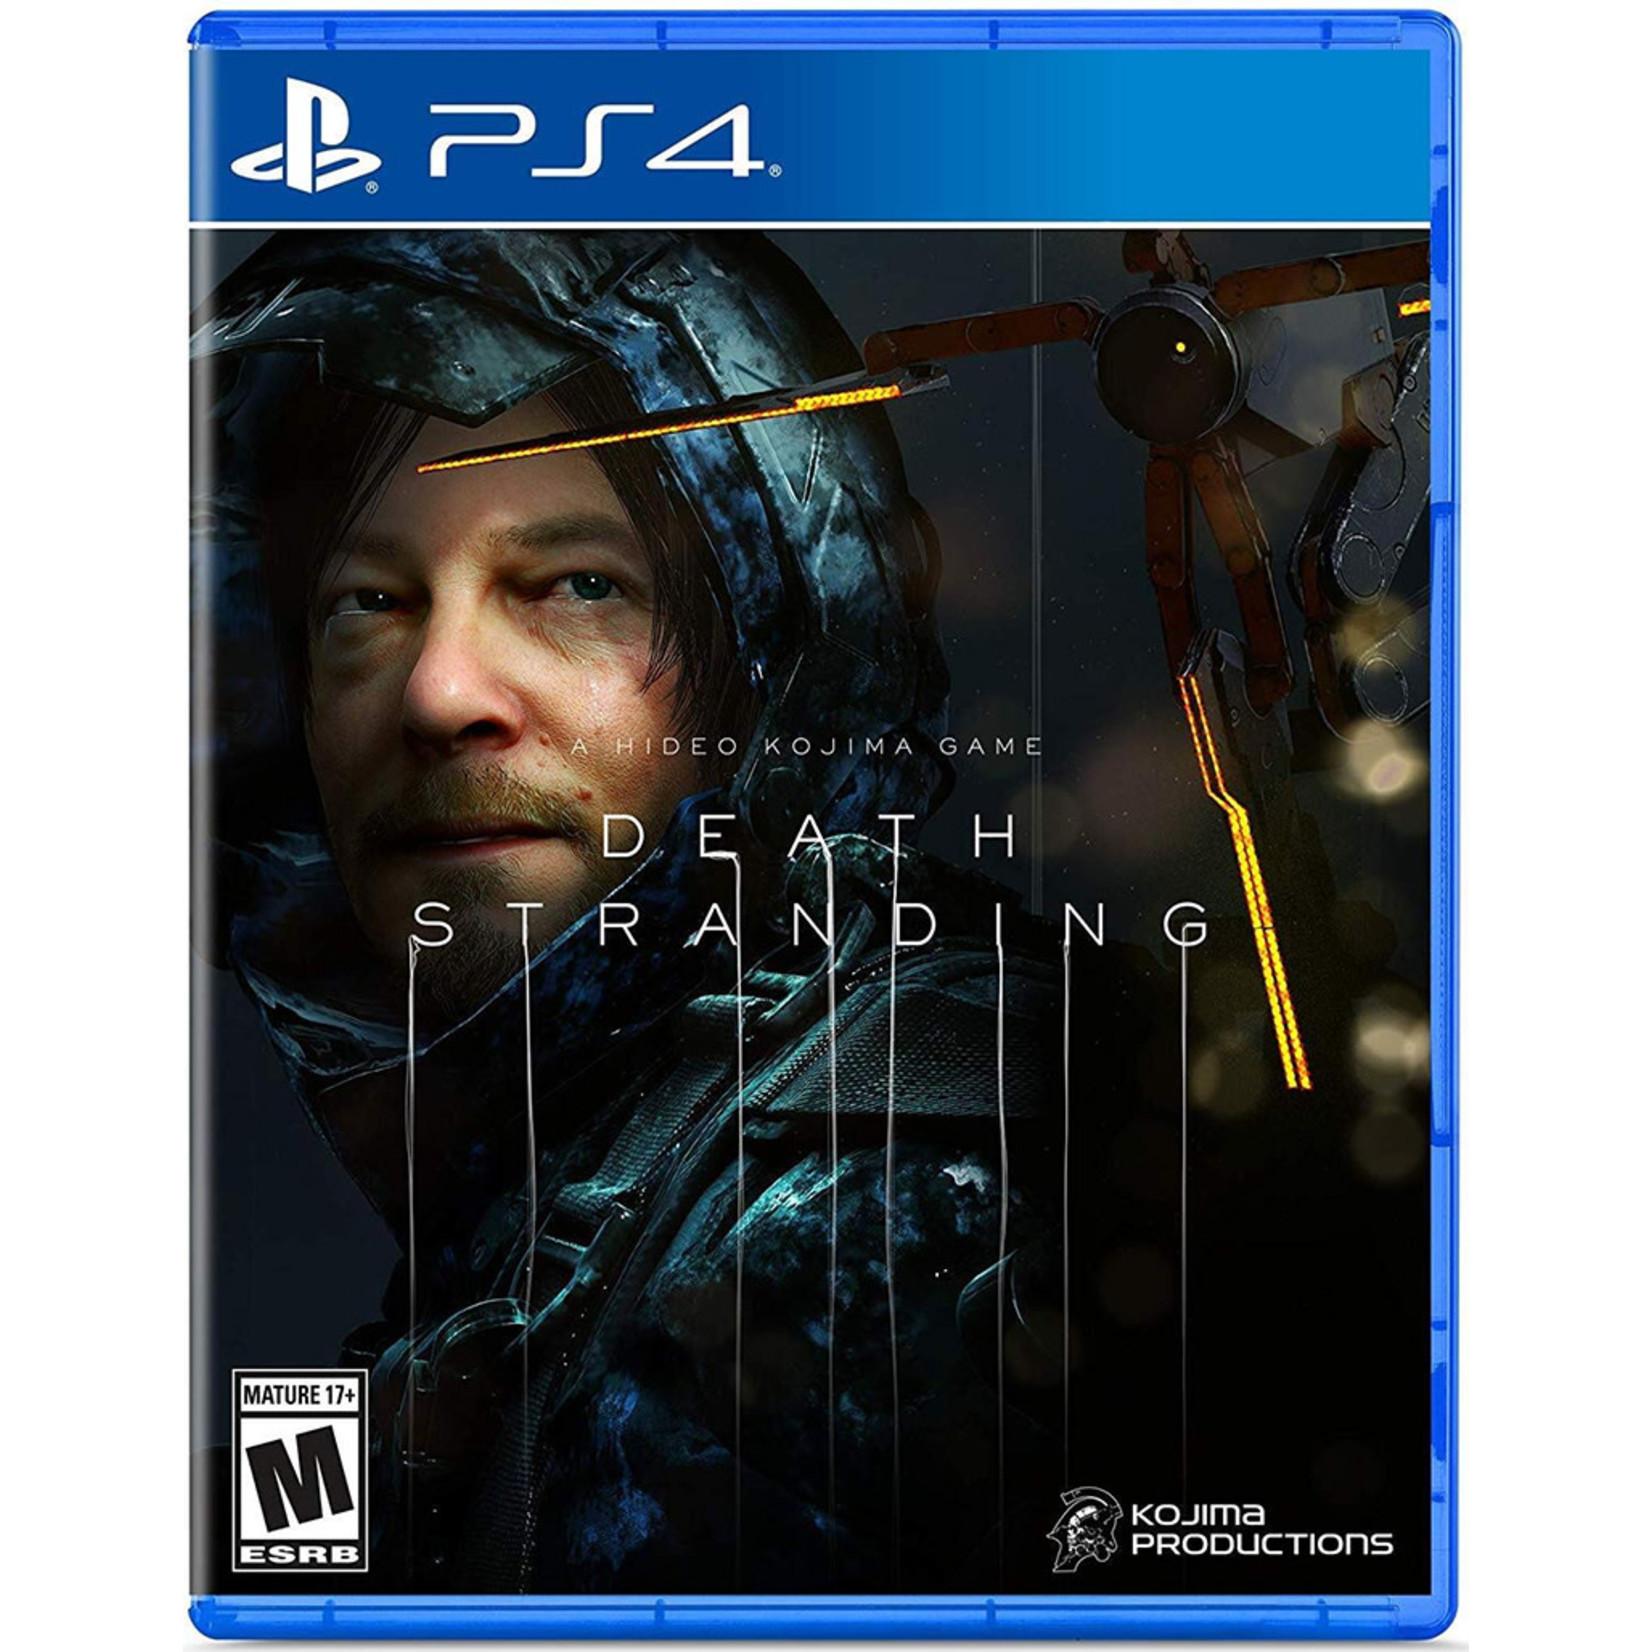 PS4-Death Stranding